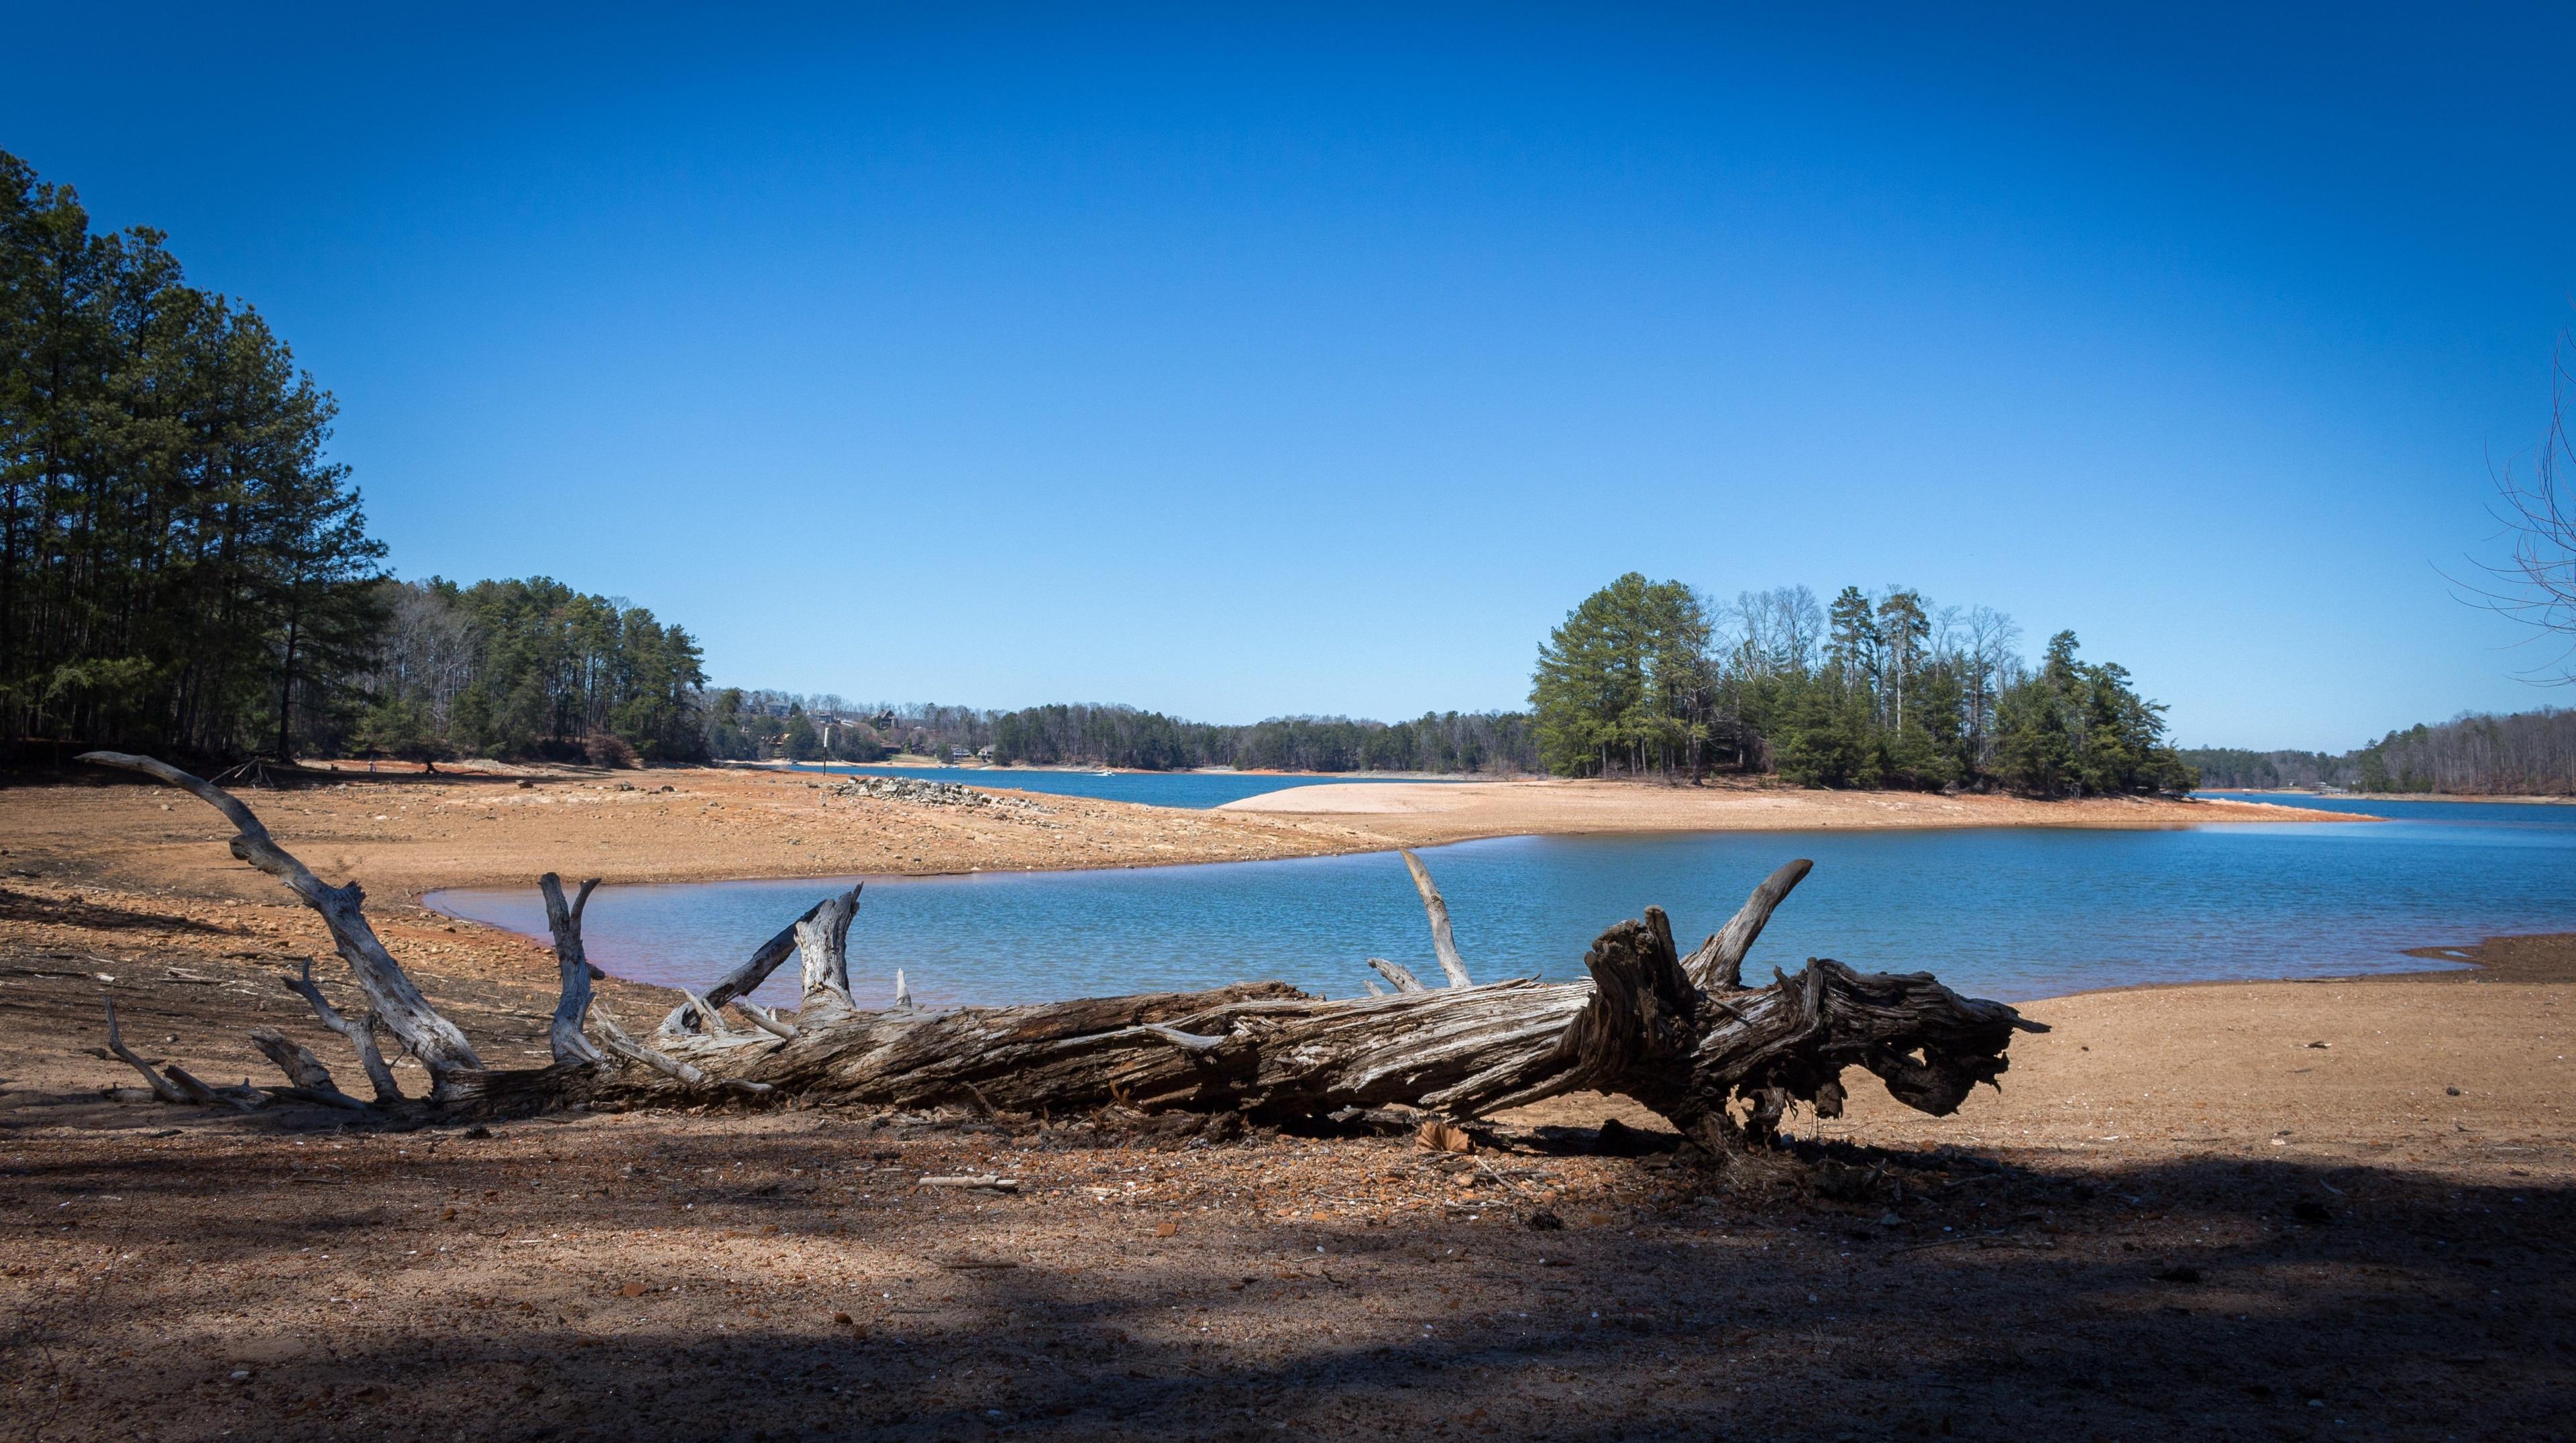 Lake Lanier, Gainesville, Georgia, USA